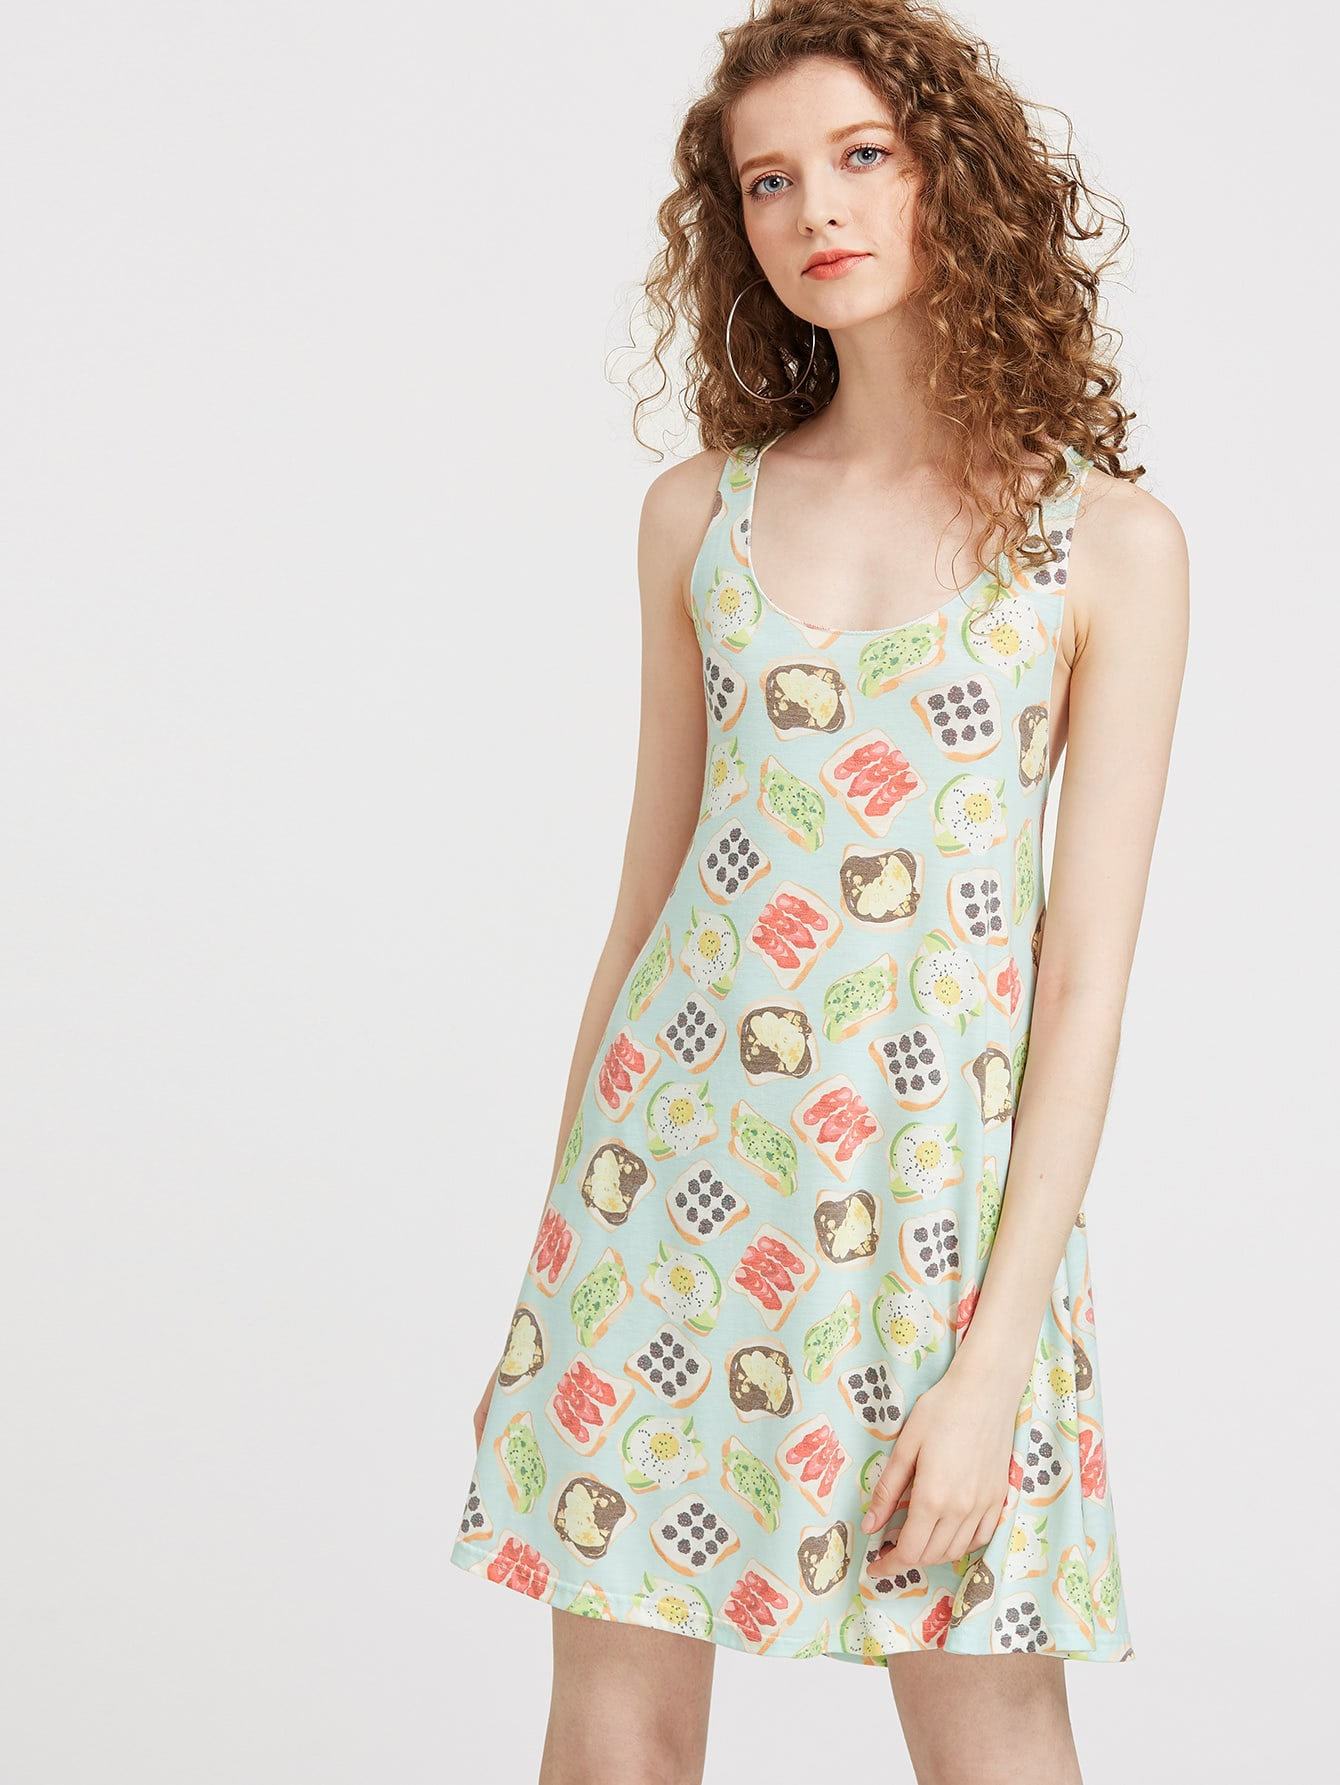 Фото Sandwich Print Double Scoop A Line Tank Dress. Купить с доставкой